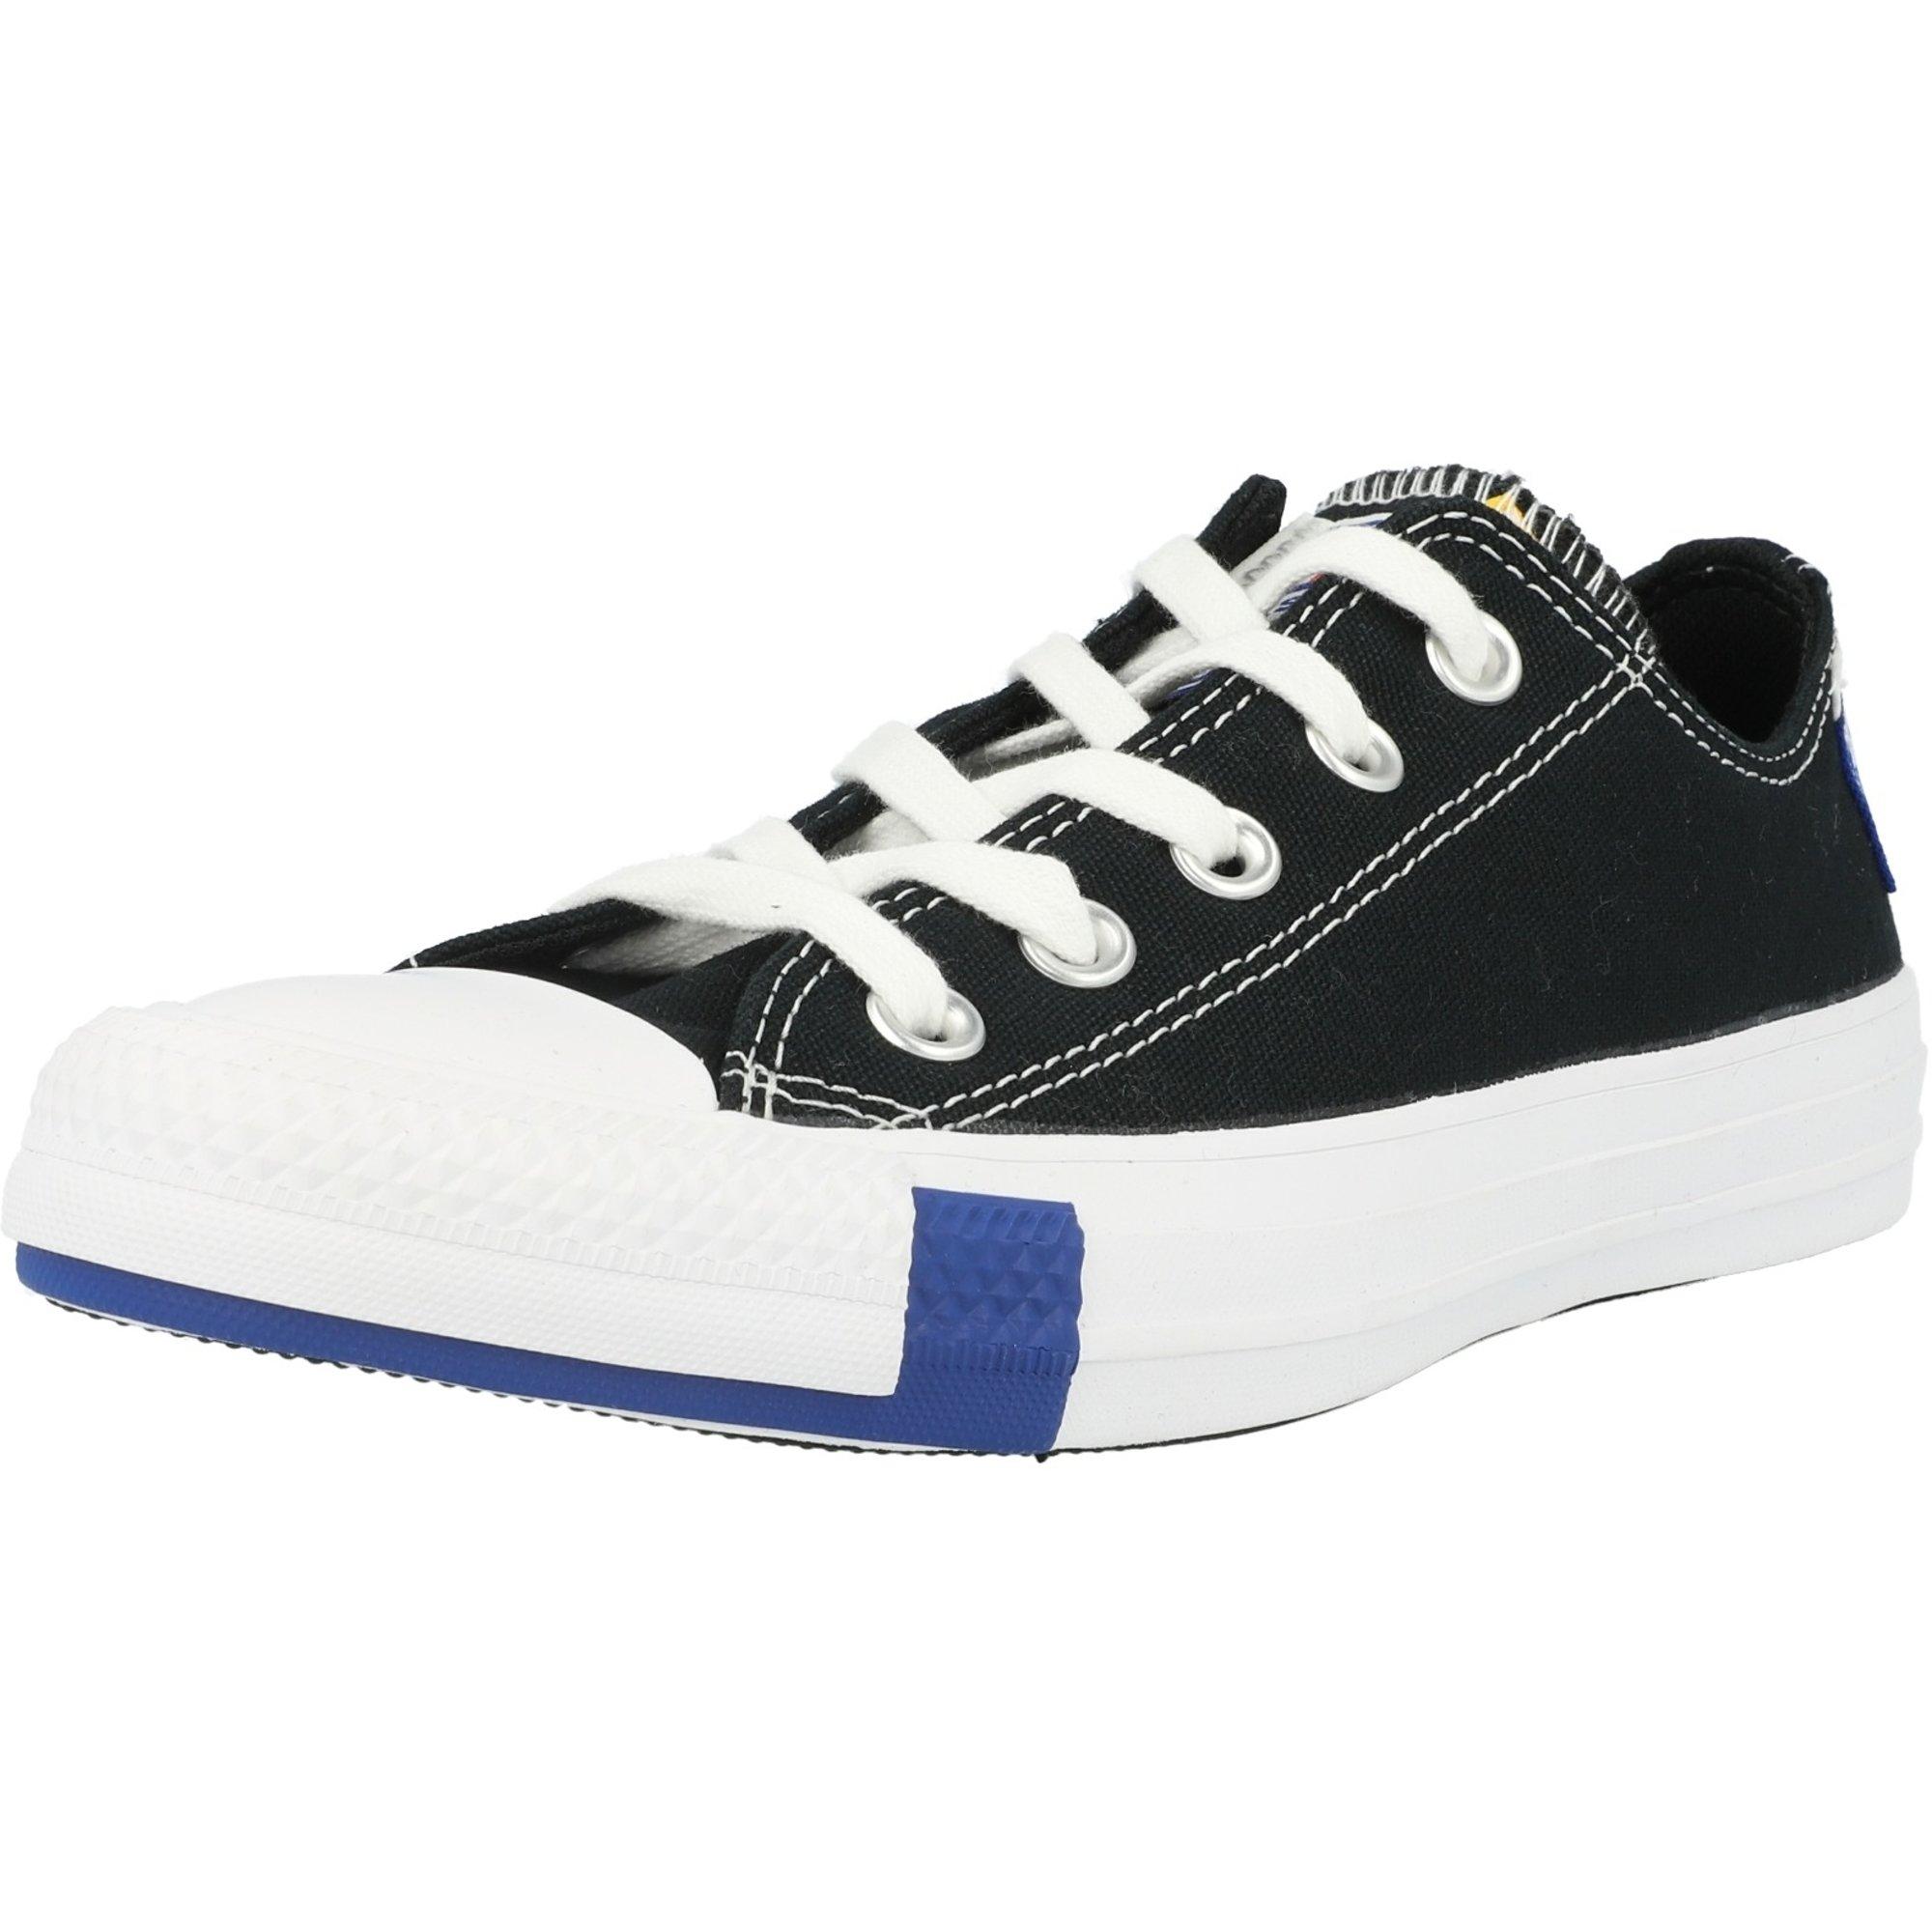 Converse Chuck Taylor All Star Ox Logo Play Black/Rush Blue Canvas